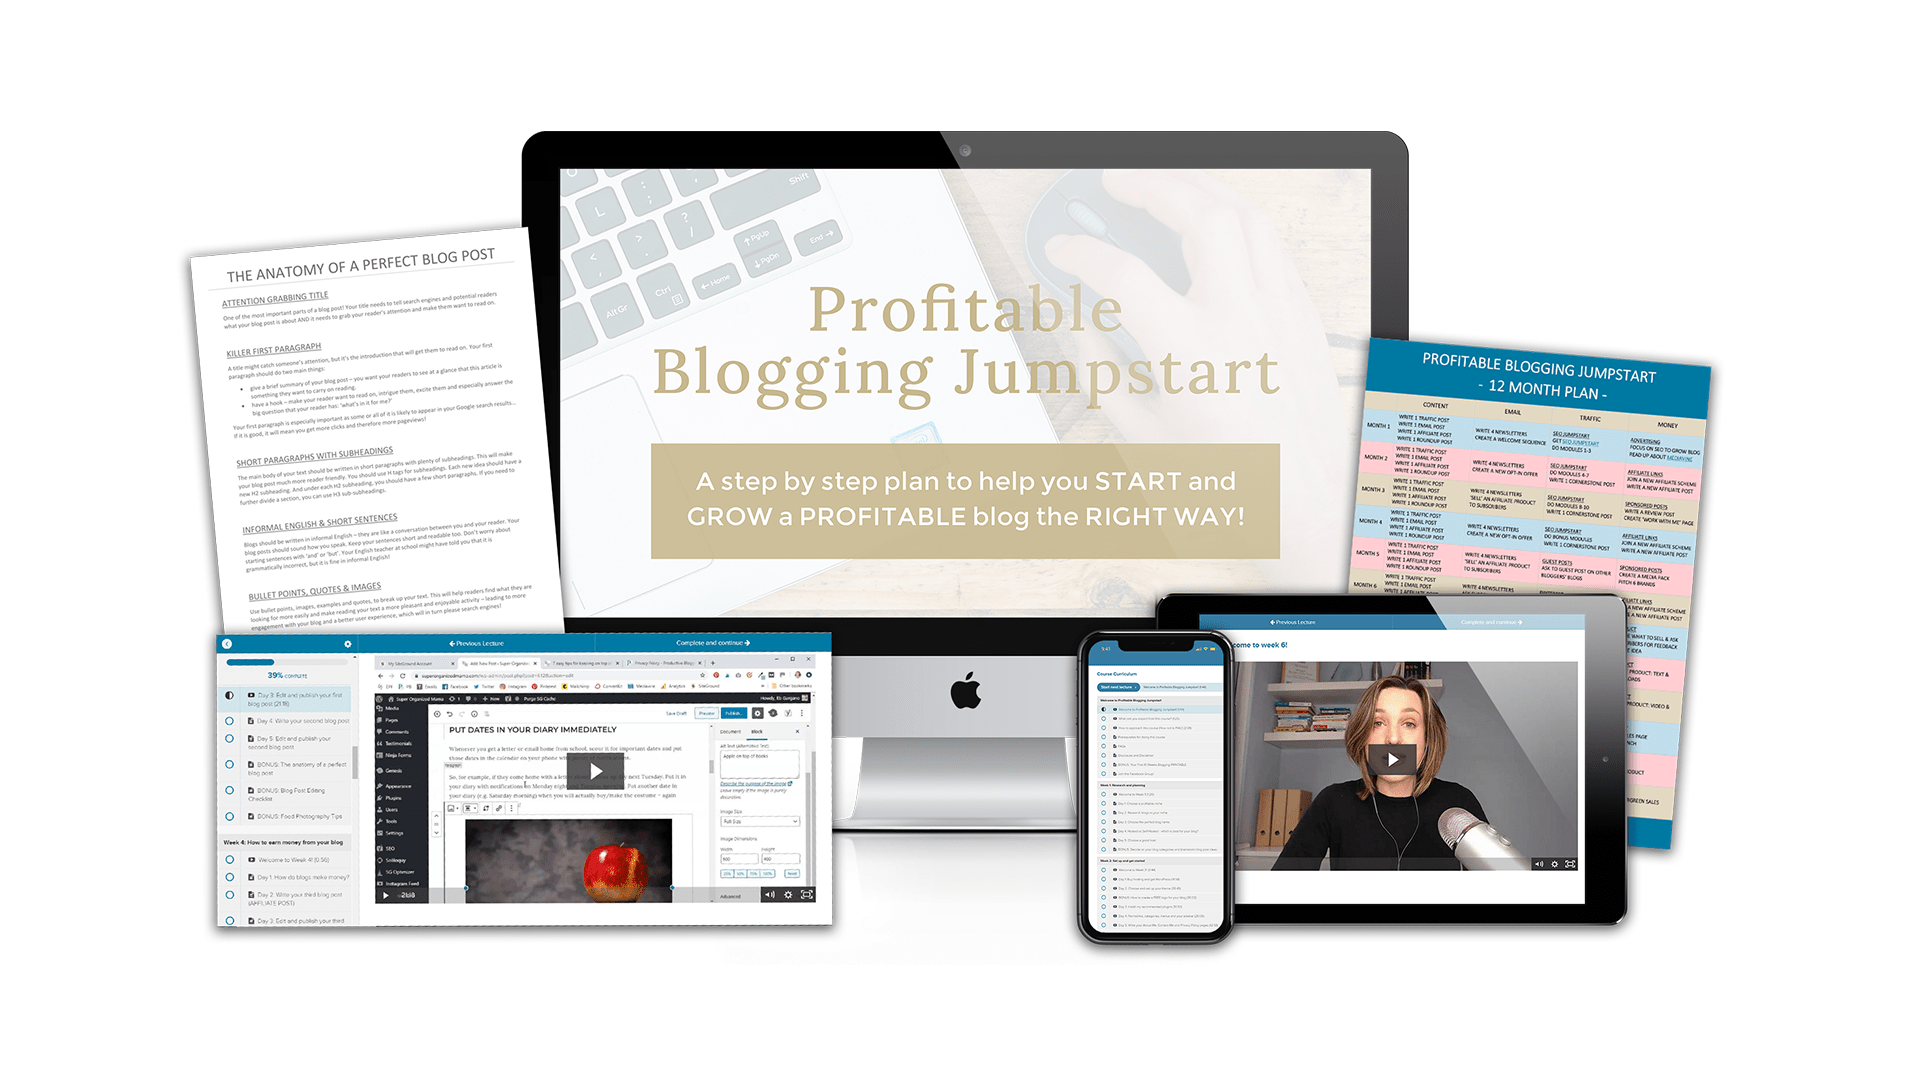 Profitable Blogging Jumpstart Course